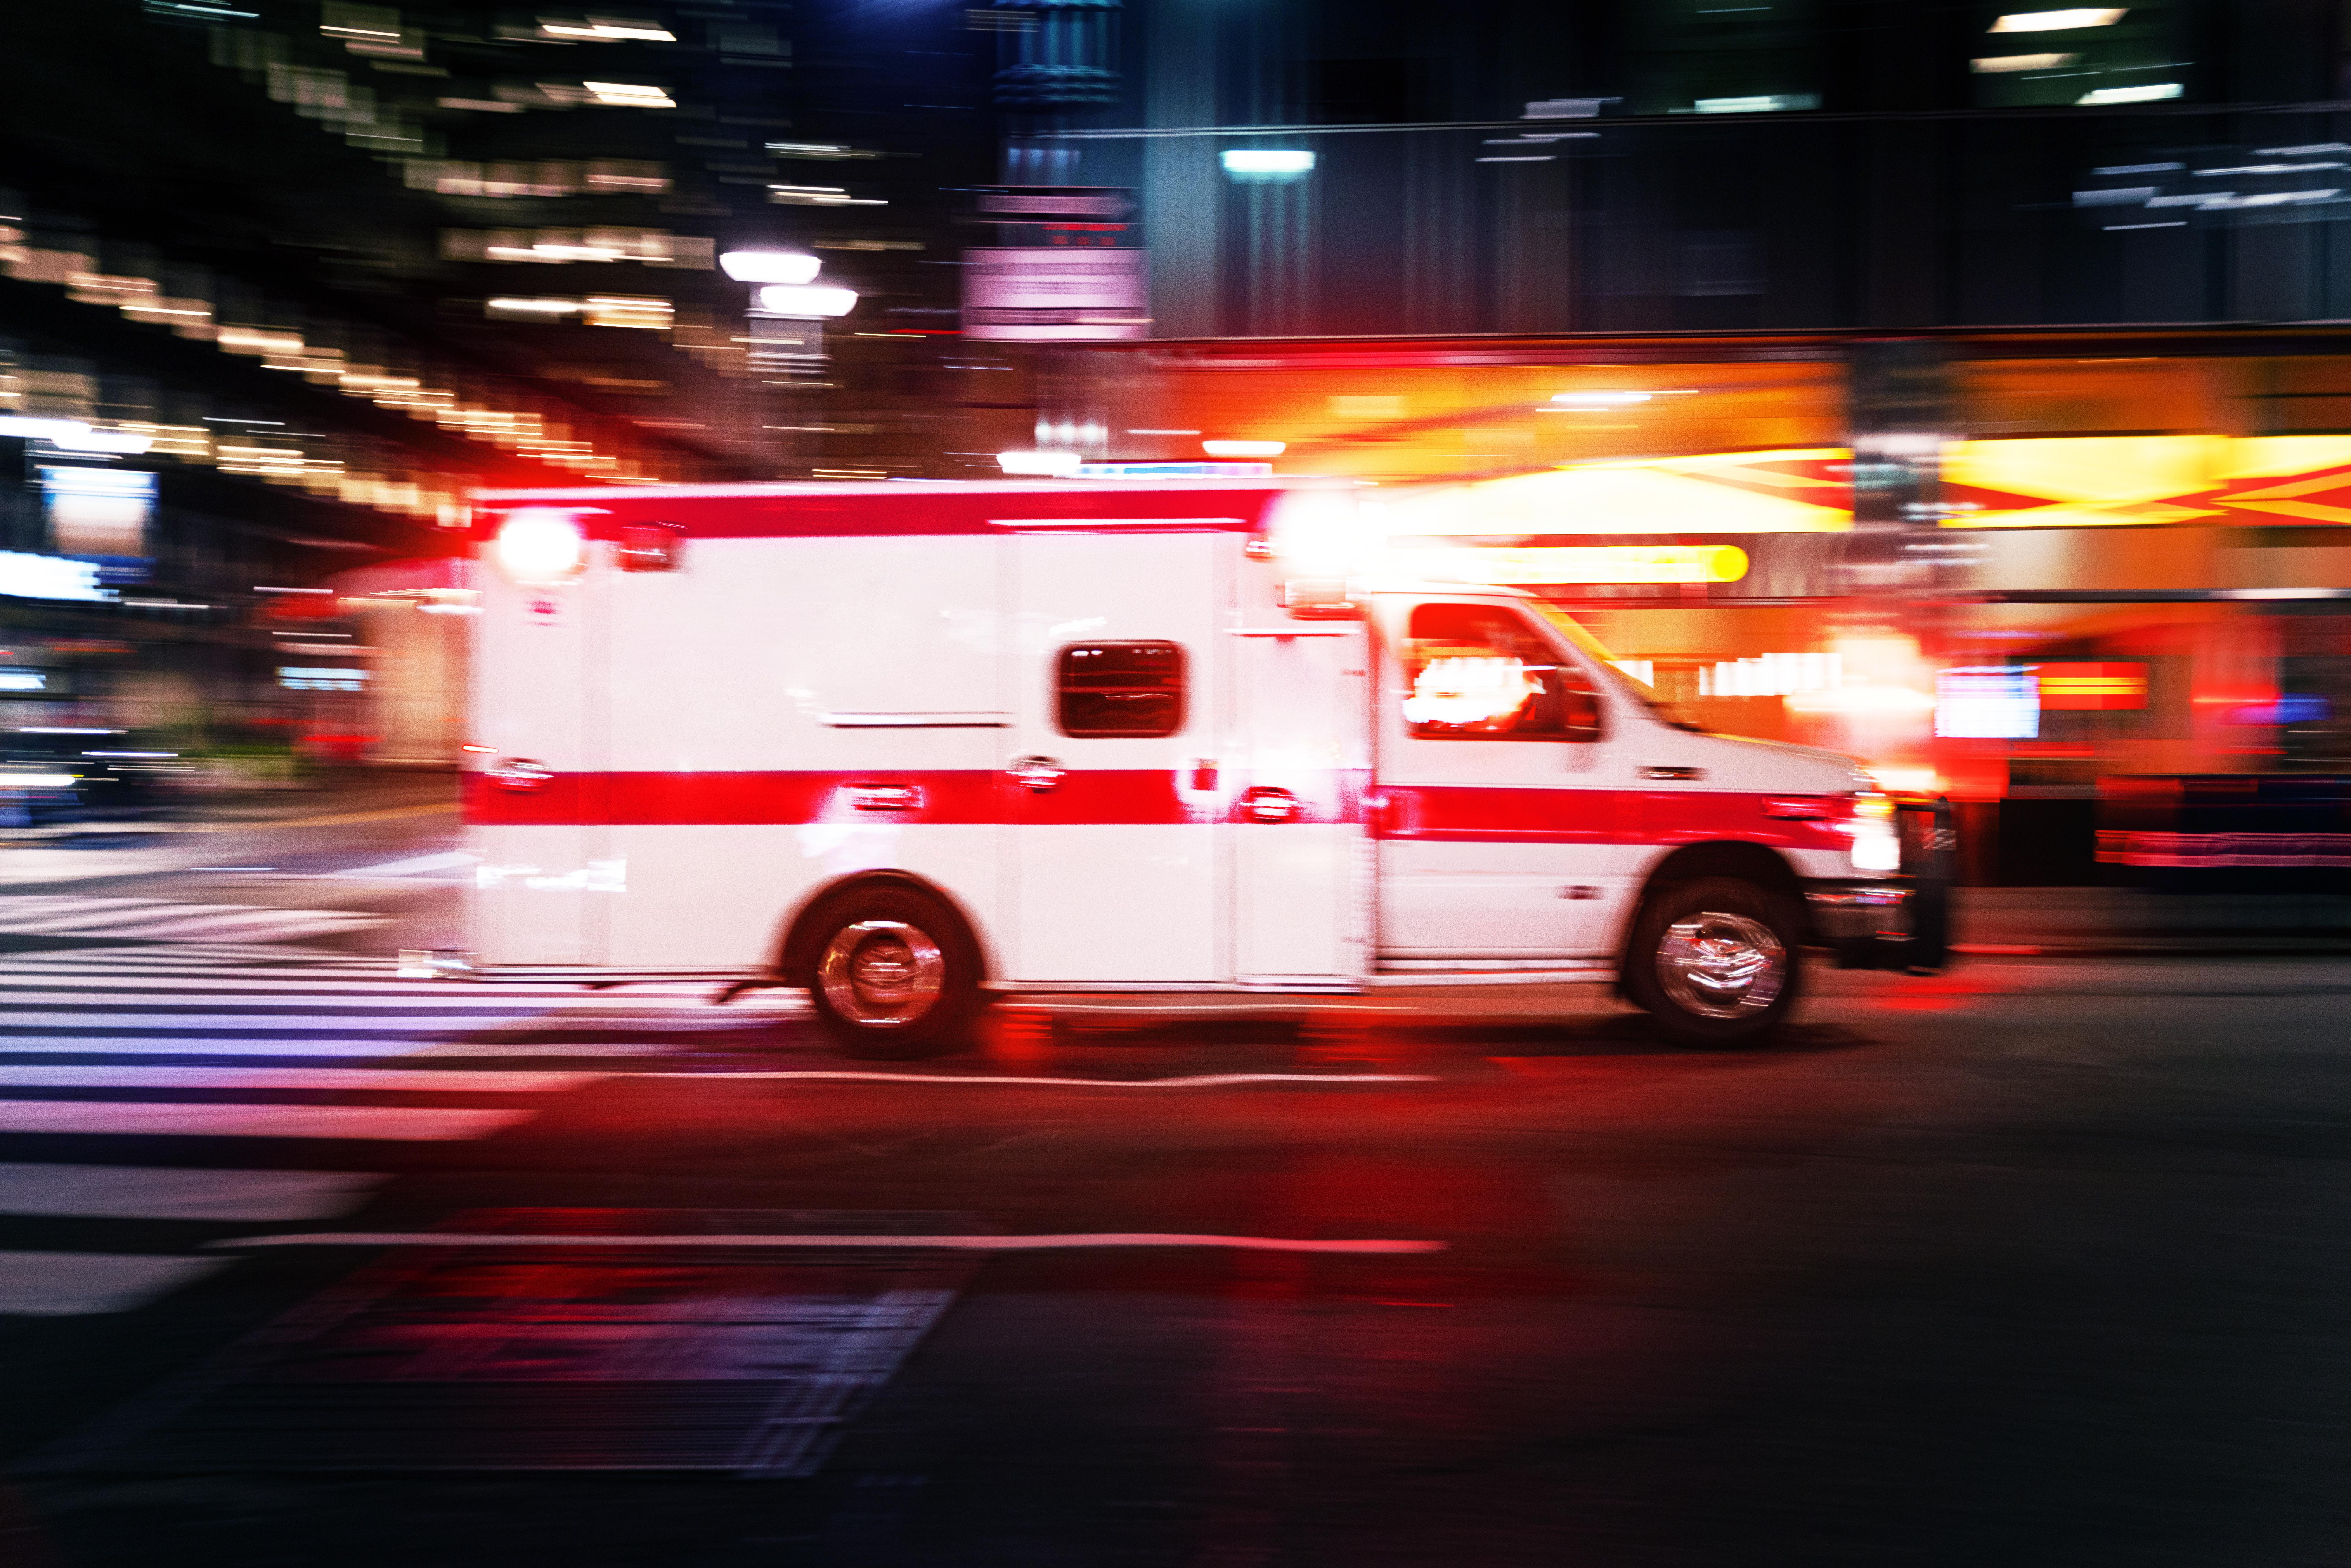 Ambulance speeding at night in New York City - motion blur panning action